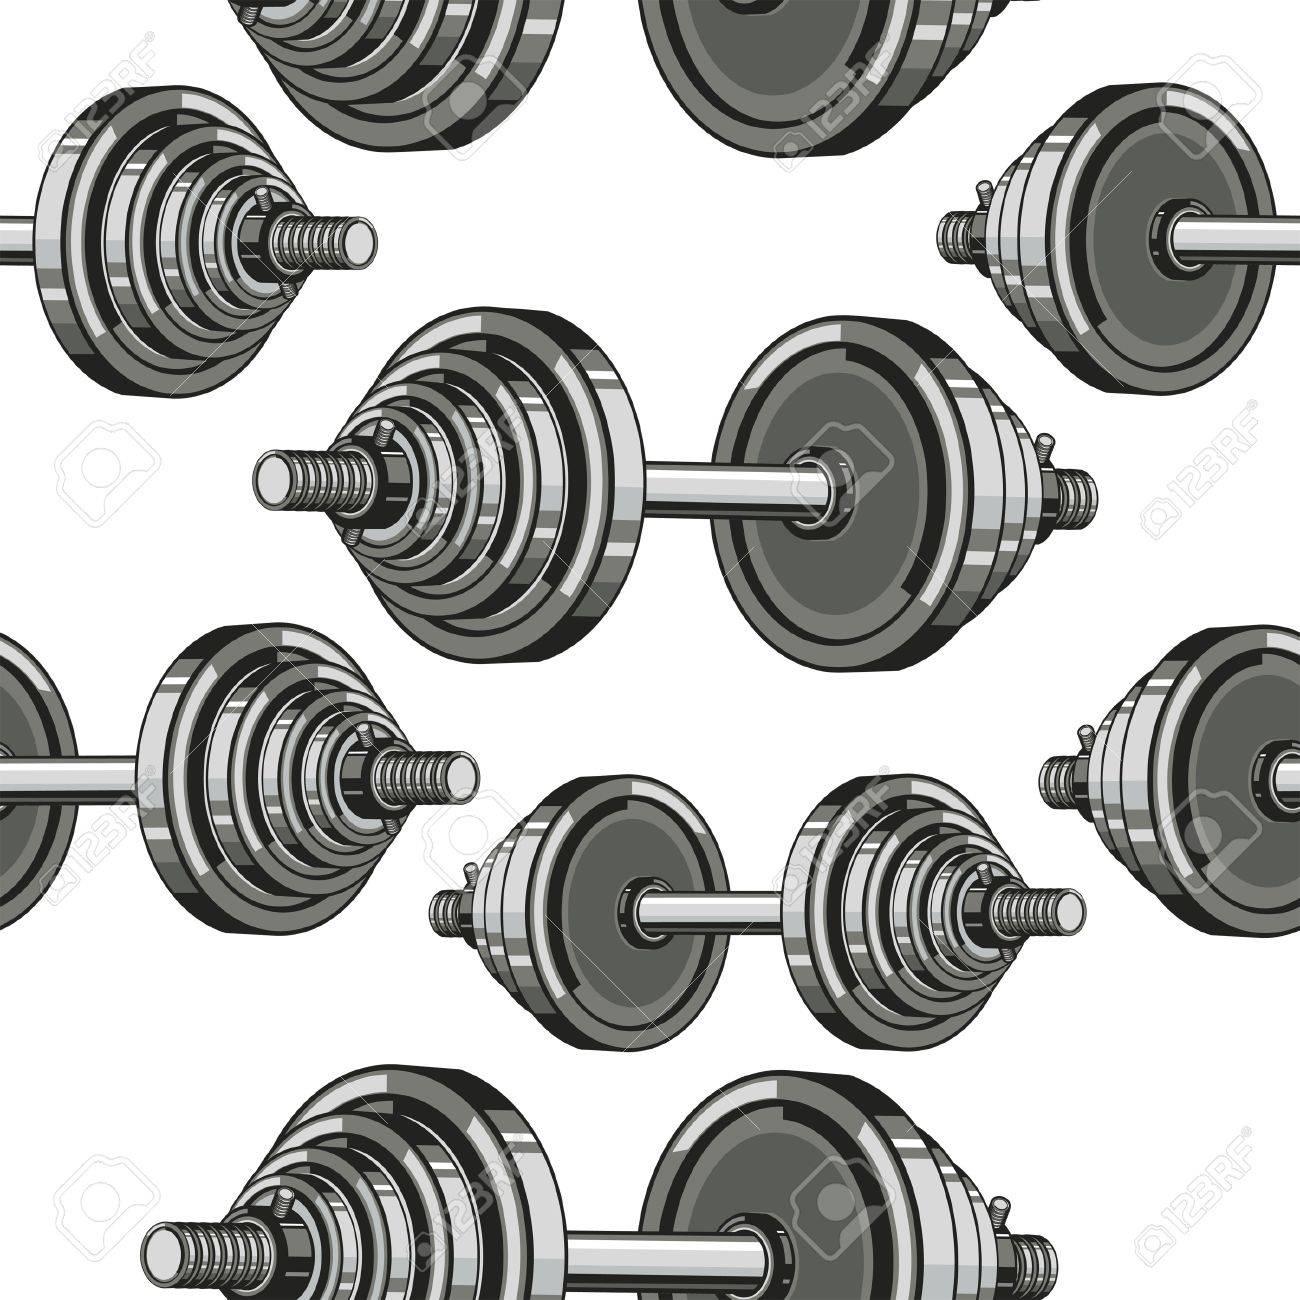 Dumbbells Seamless Pattern. Vector illustration Stock Vector - 18759040